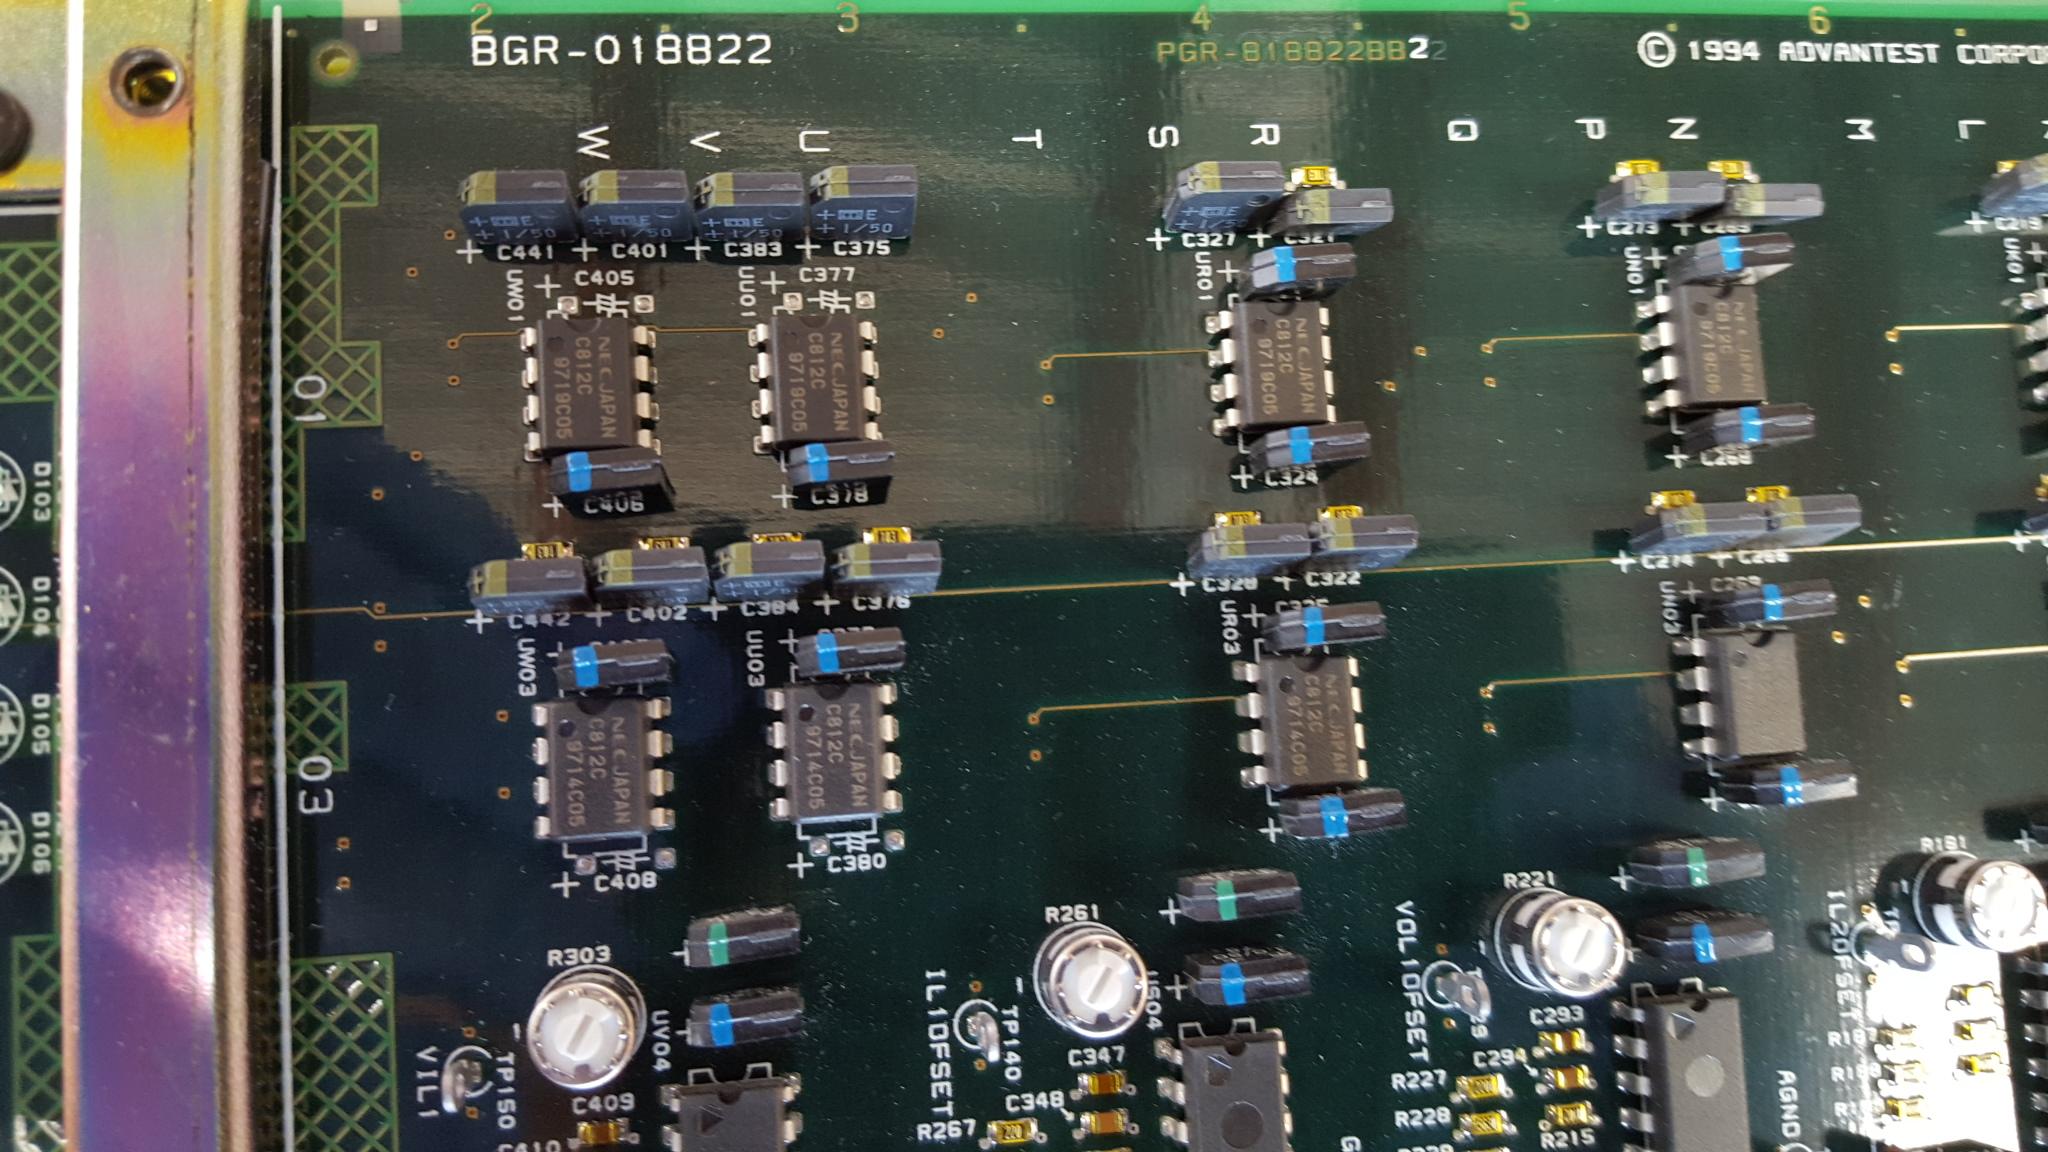 For Sale Dual Air Zenith Ob1 Compressor Wiring Diagram Advantest Bgr 018822 T5335p Pc Board